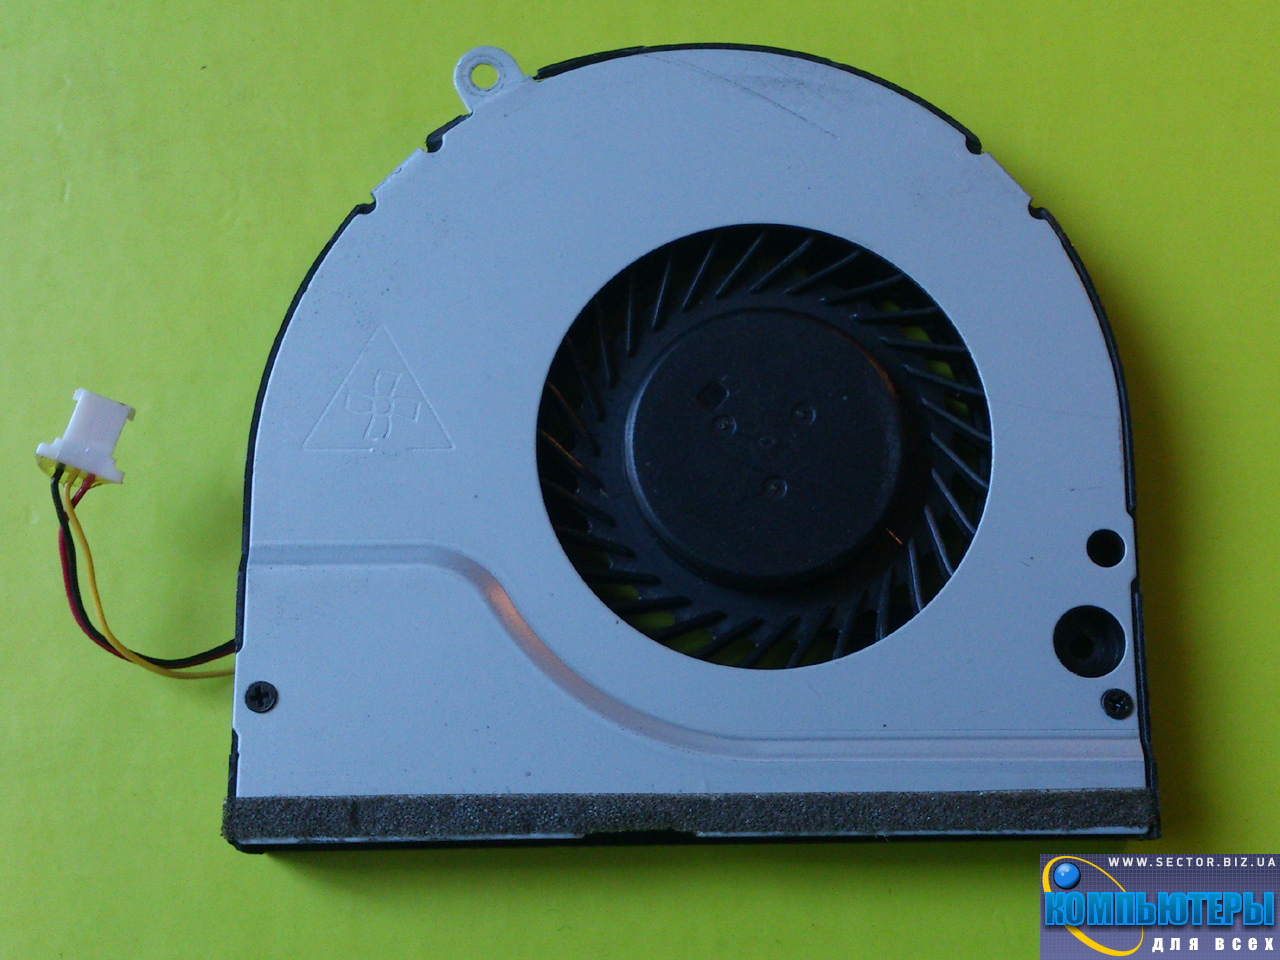 Кулер к ноутбуку Packard Bell EasyNote TE69BM TE69CX p/n: DFS501105FQ0T FFC2. Фото № 2.